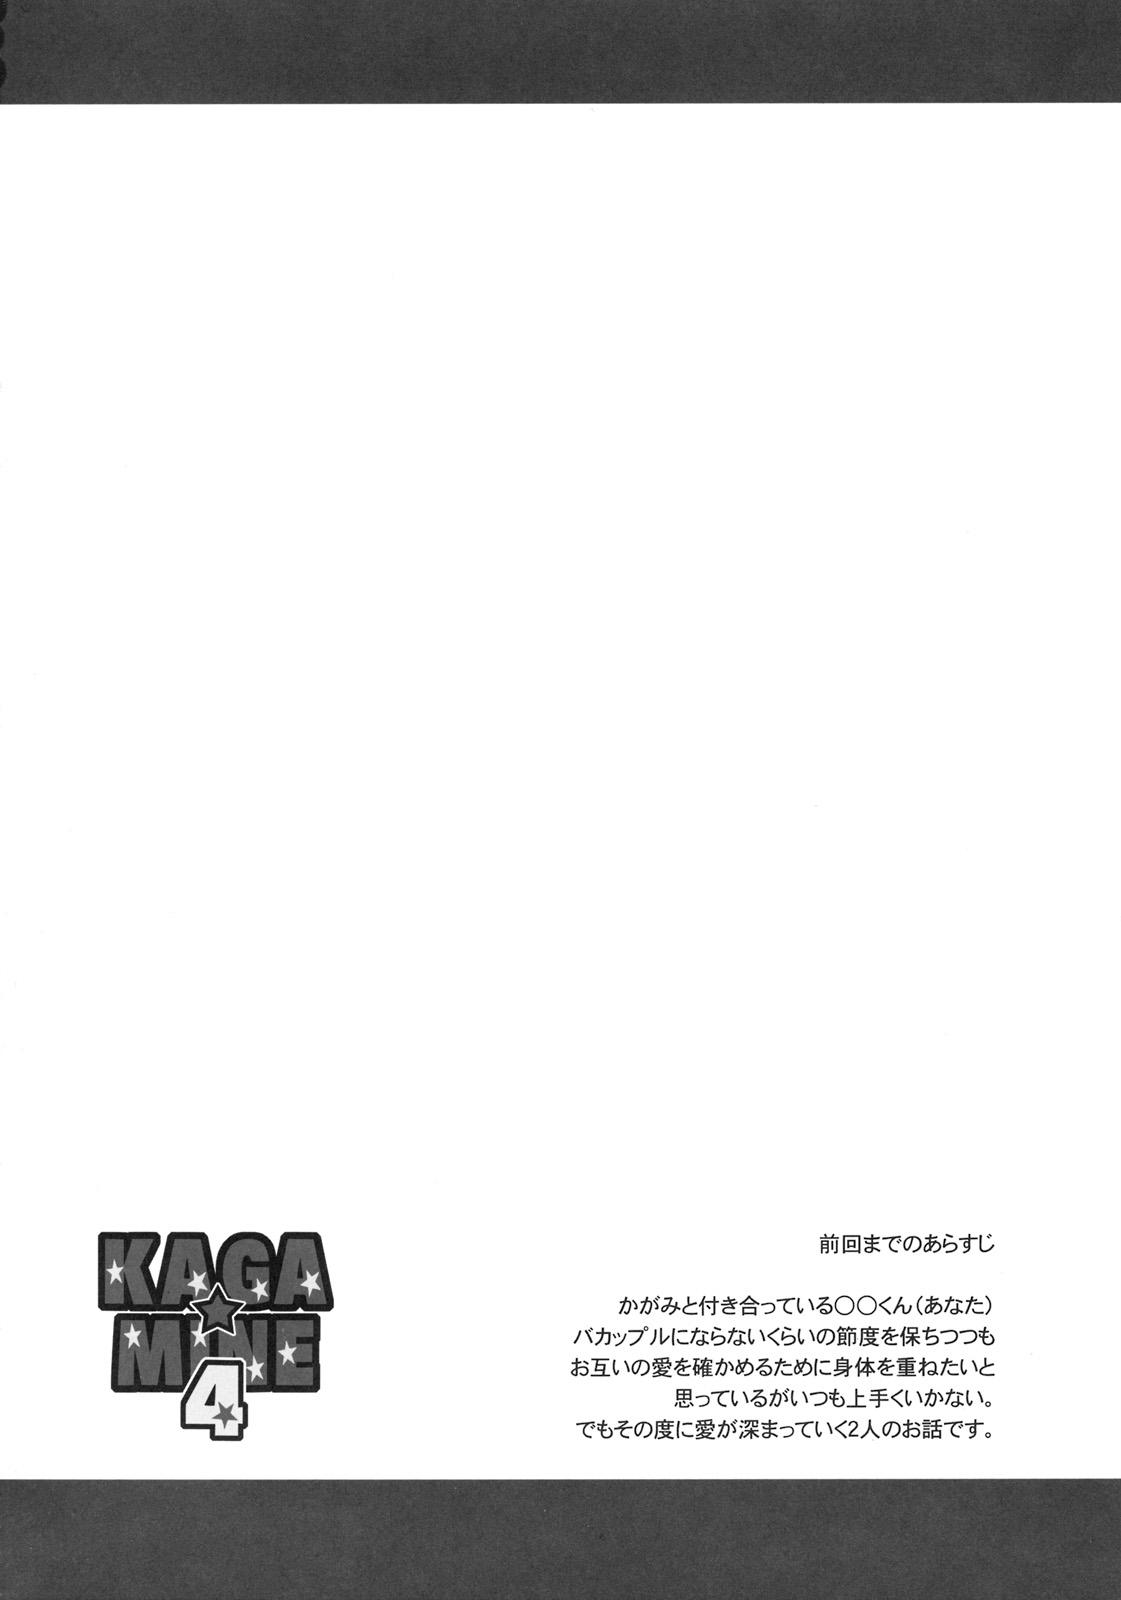 KAGA☆MINE 4 2